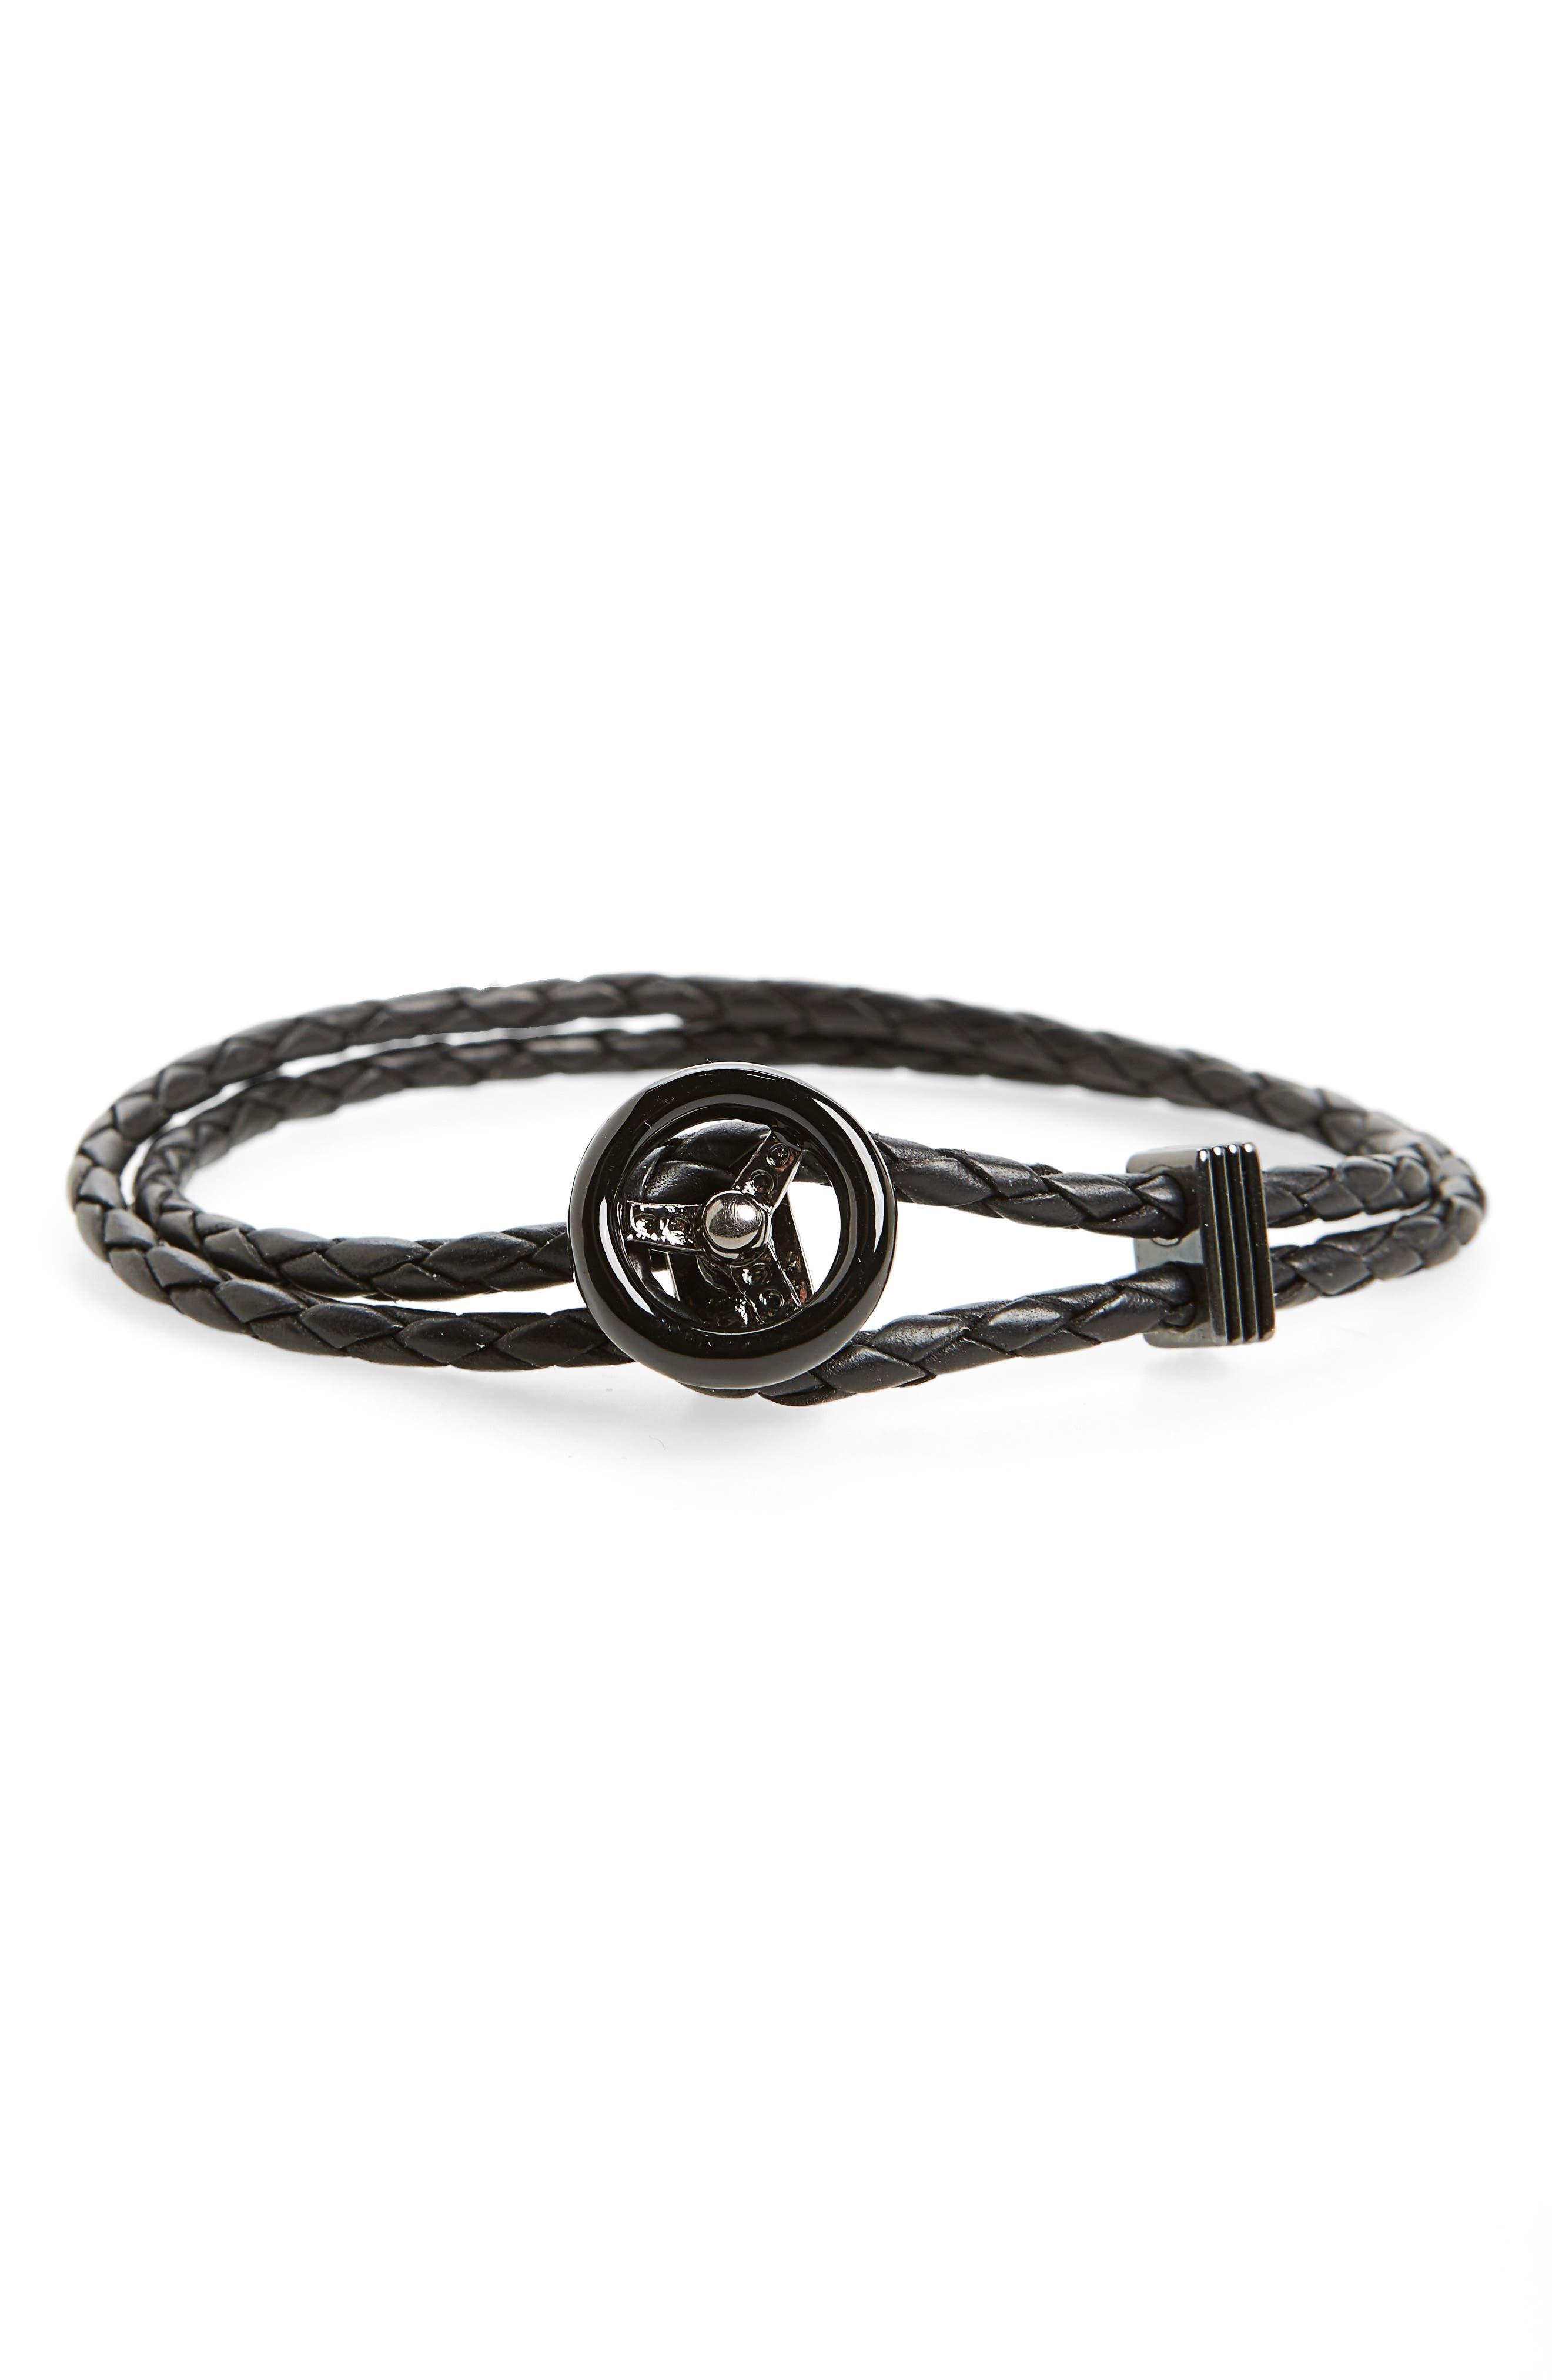 Main Image - Link Up Steering Wheel Braided Leather Bracelet